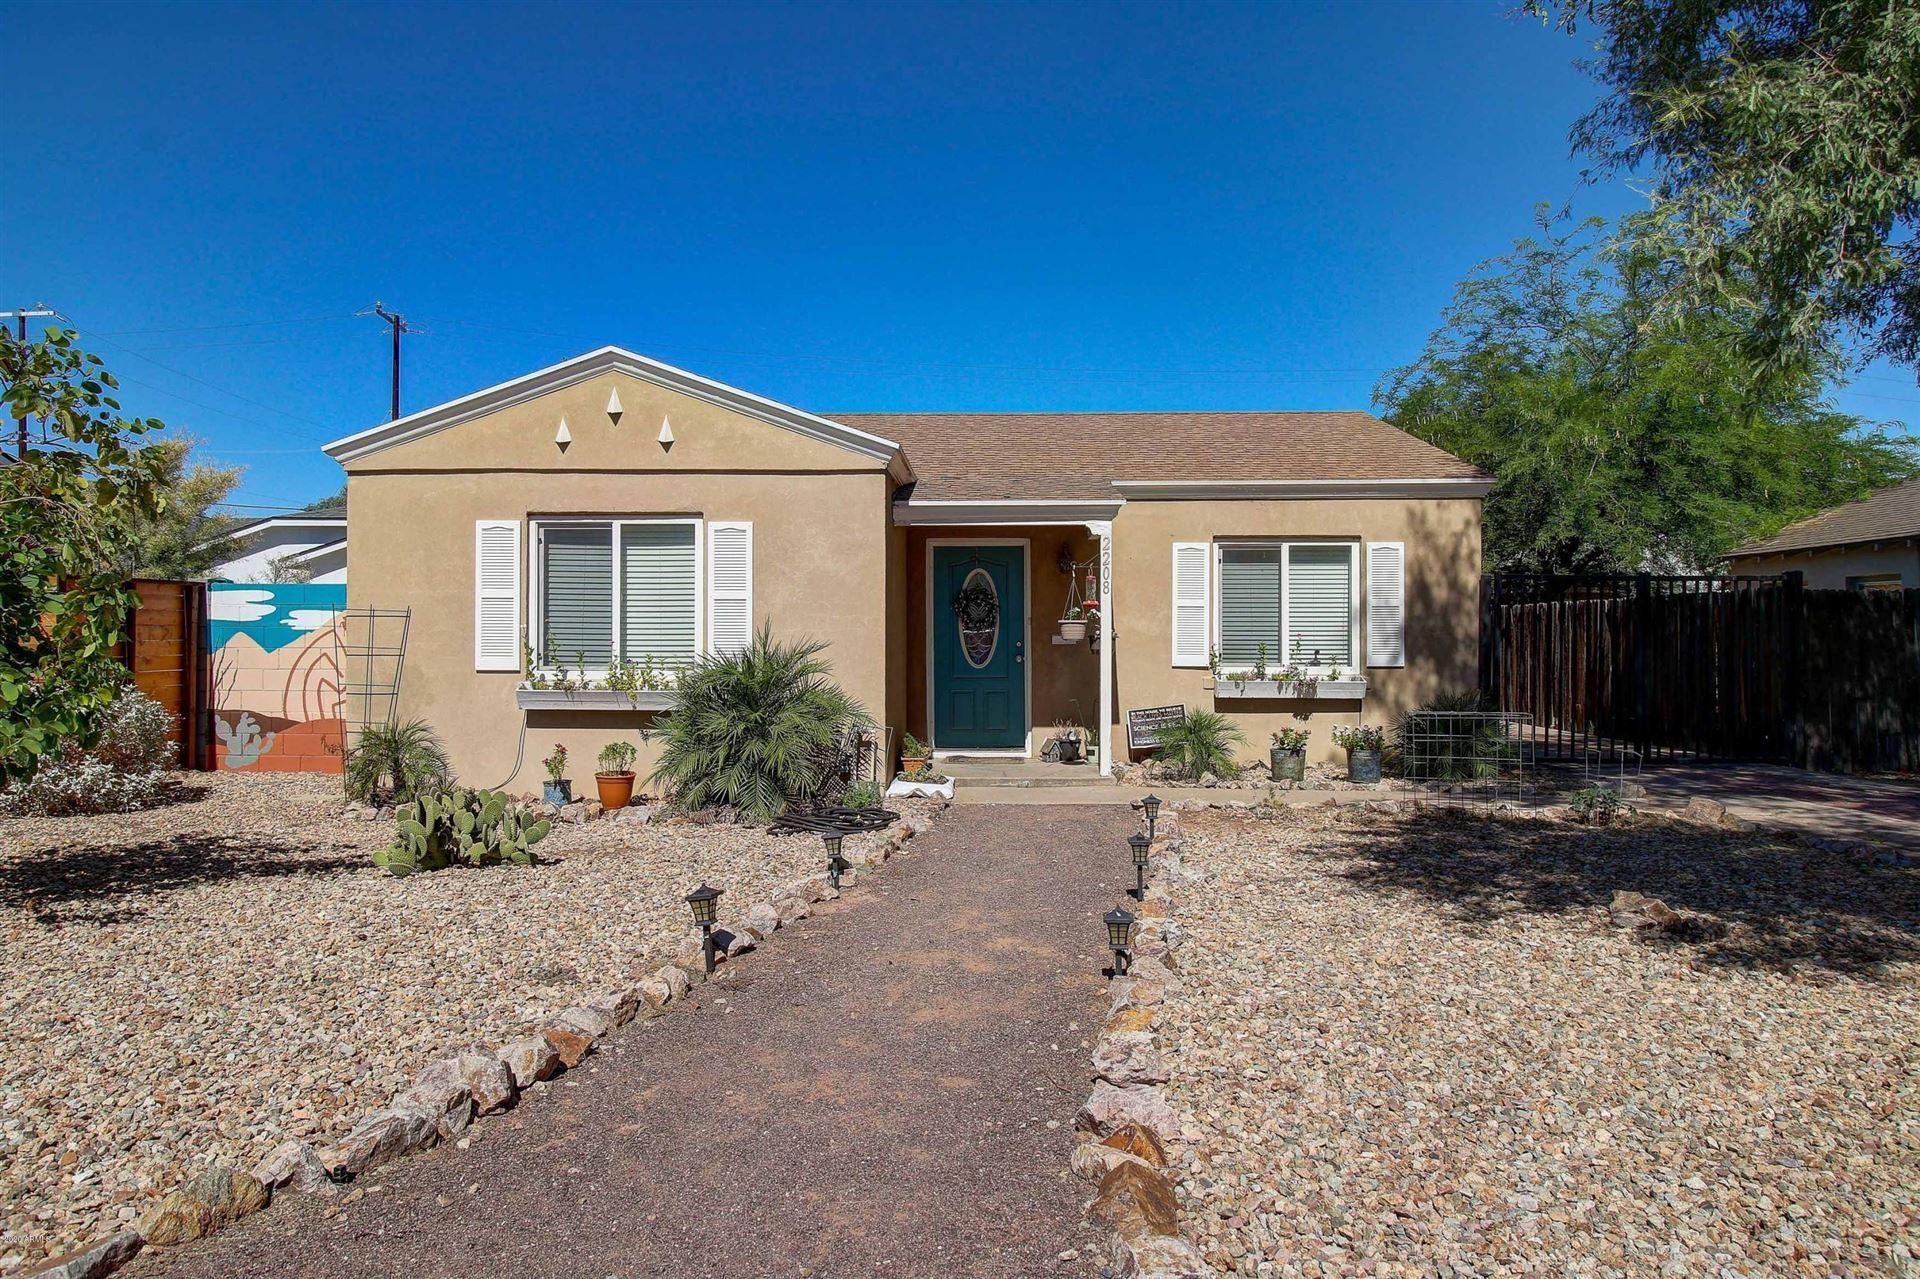 2208 N 13TH Street, Phoenix, AZ 85006 - MLS#: 6089311